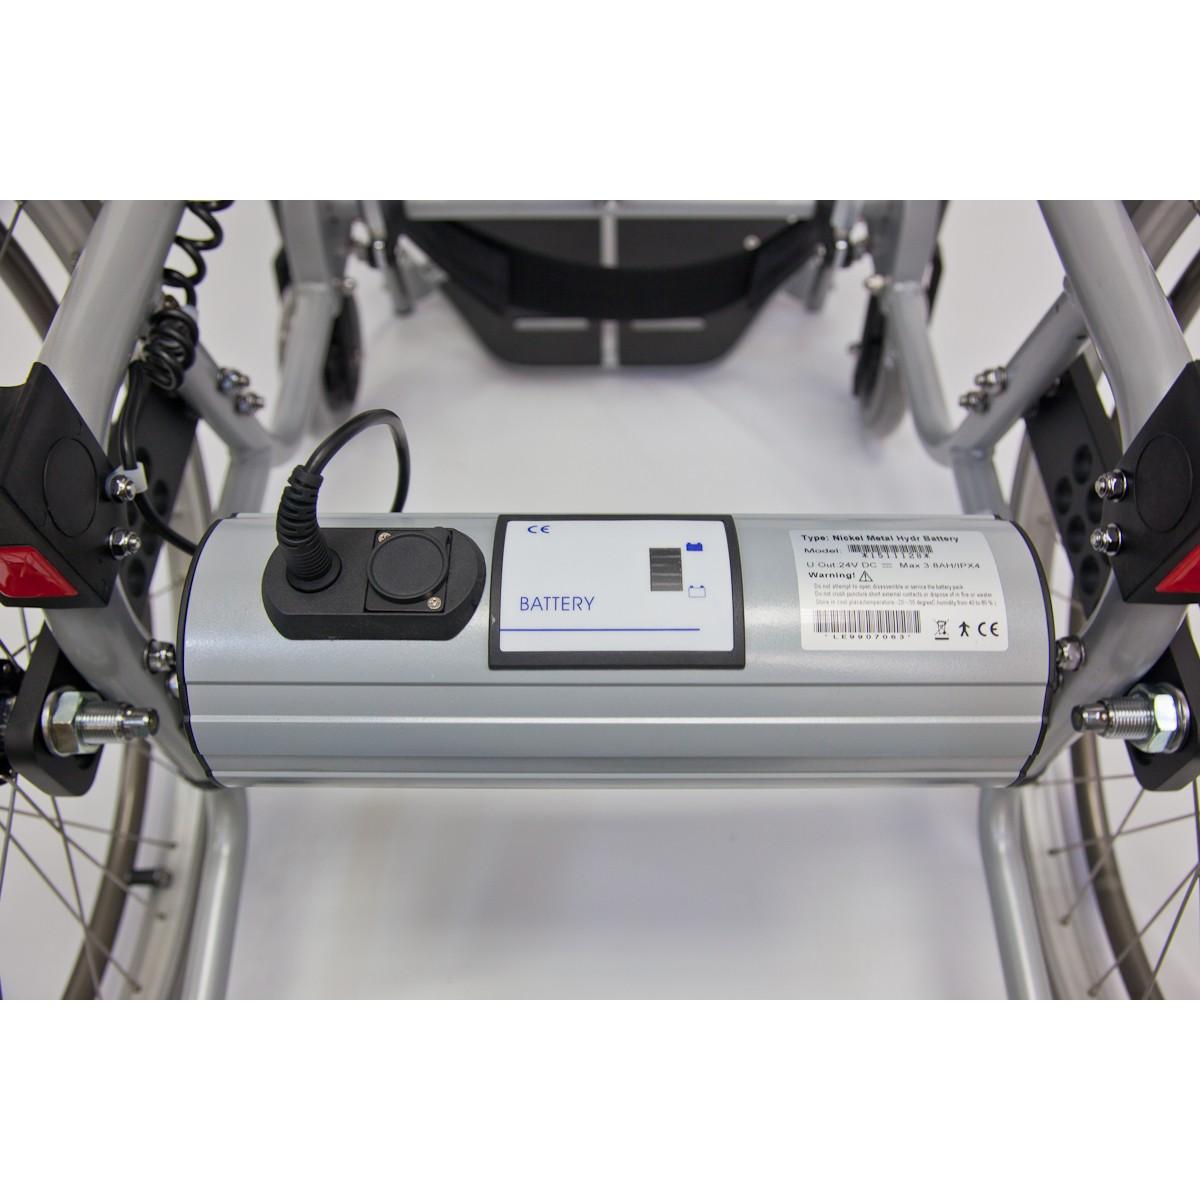 Karman XO-101 Ergonomic Wheelchair with Power Stand-Up